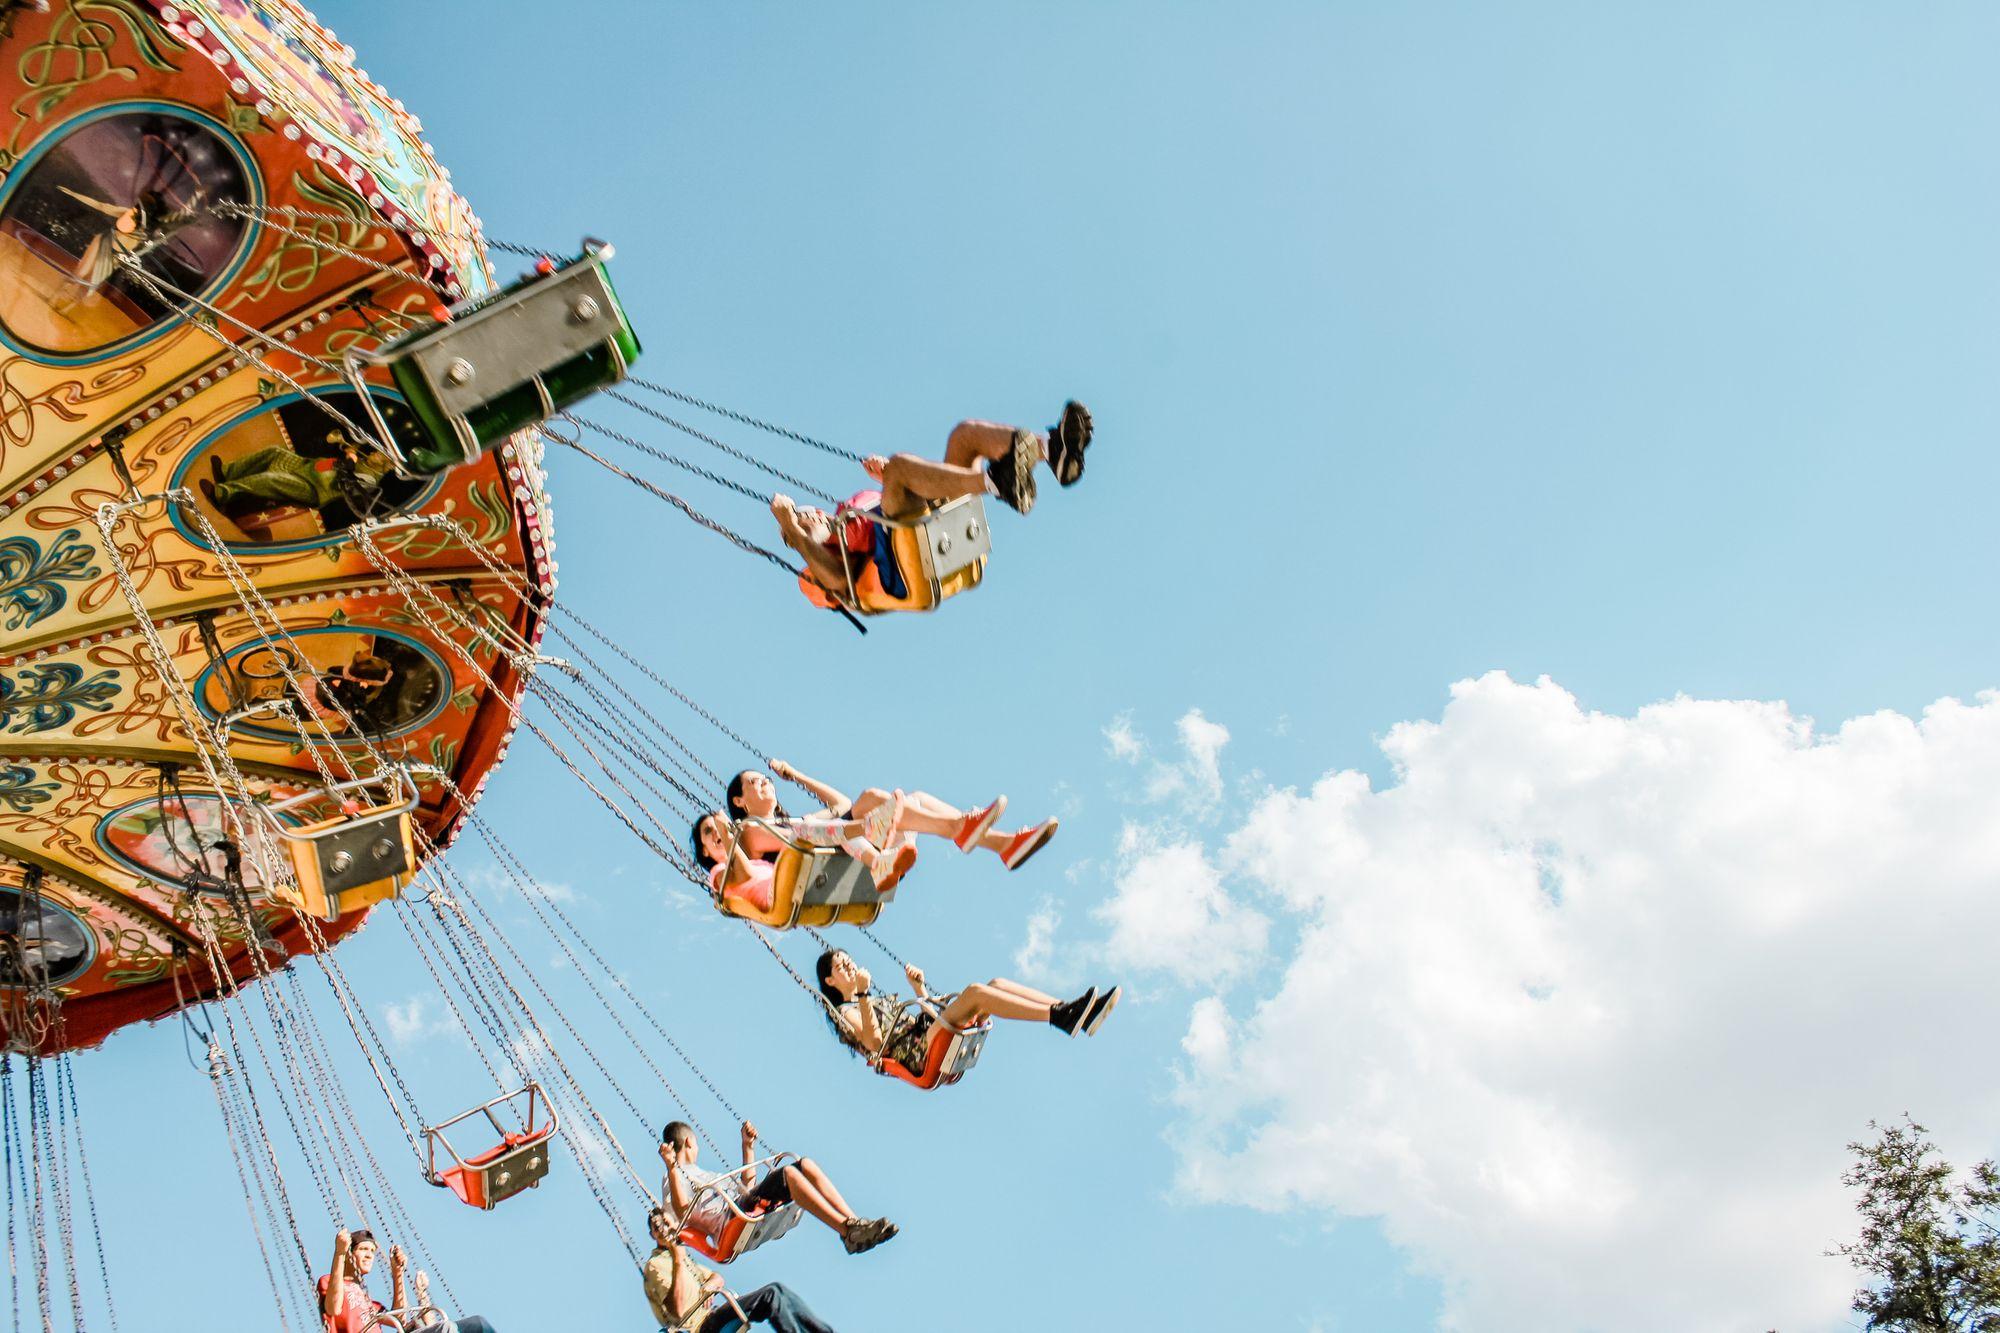 5 Best Amusement Parks In India